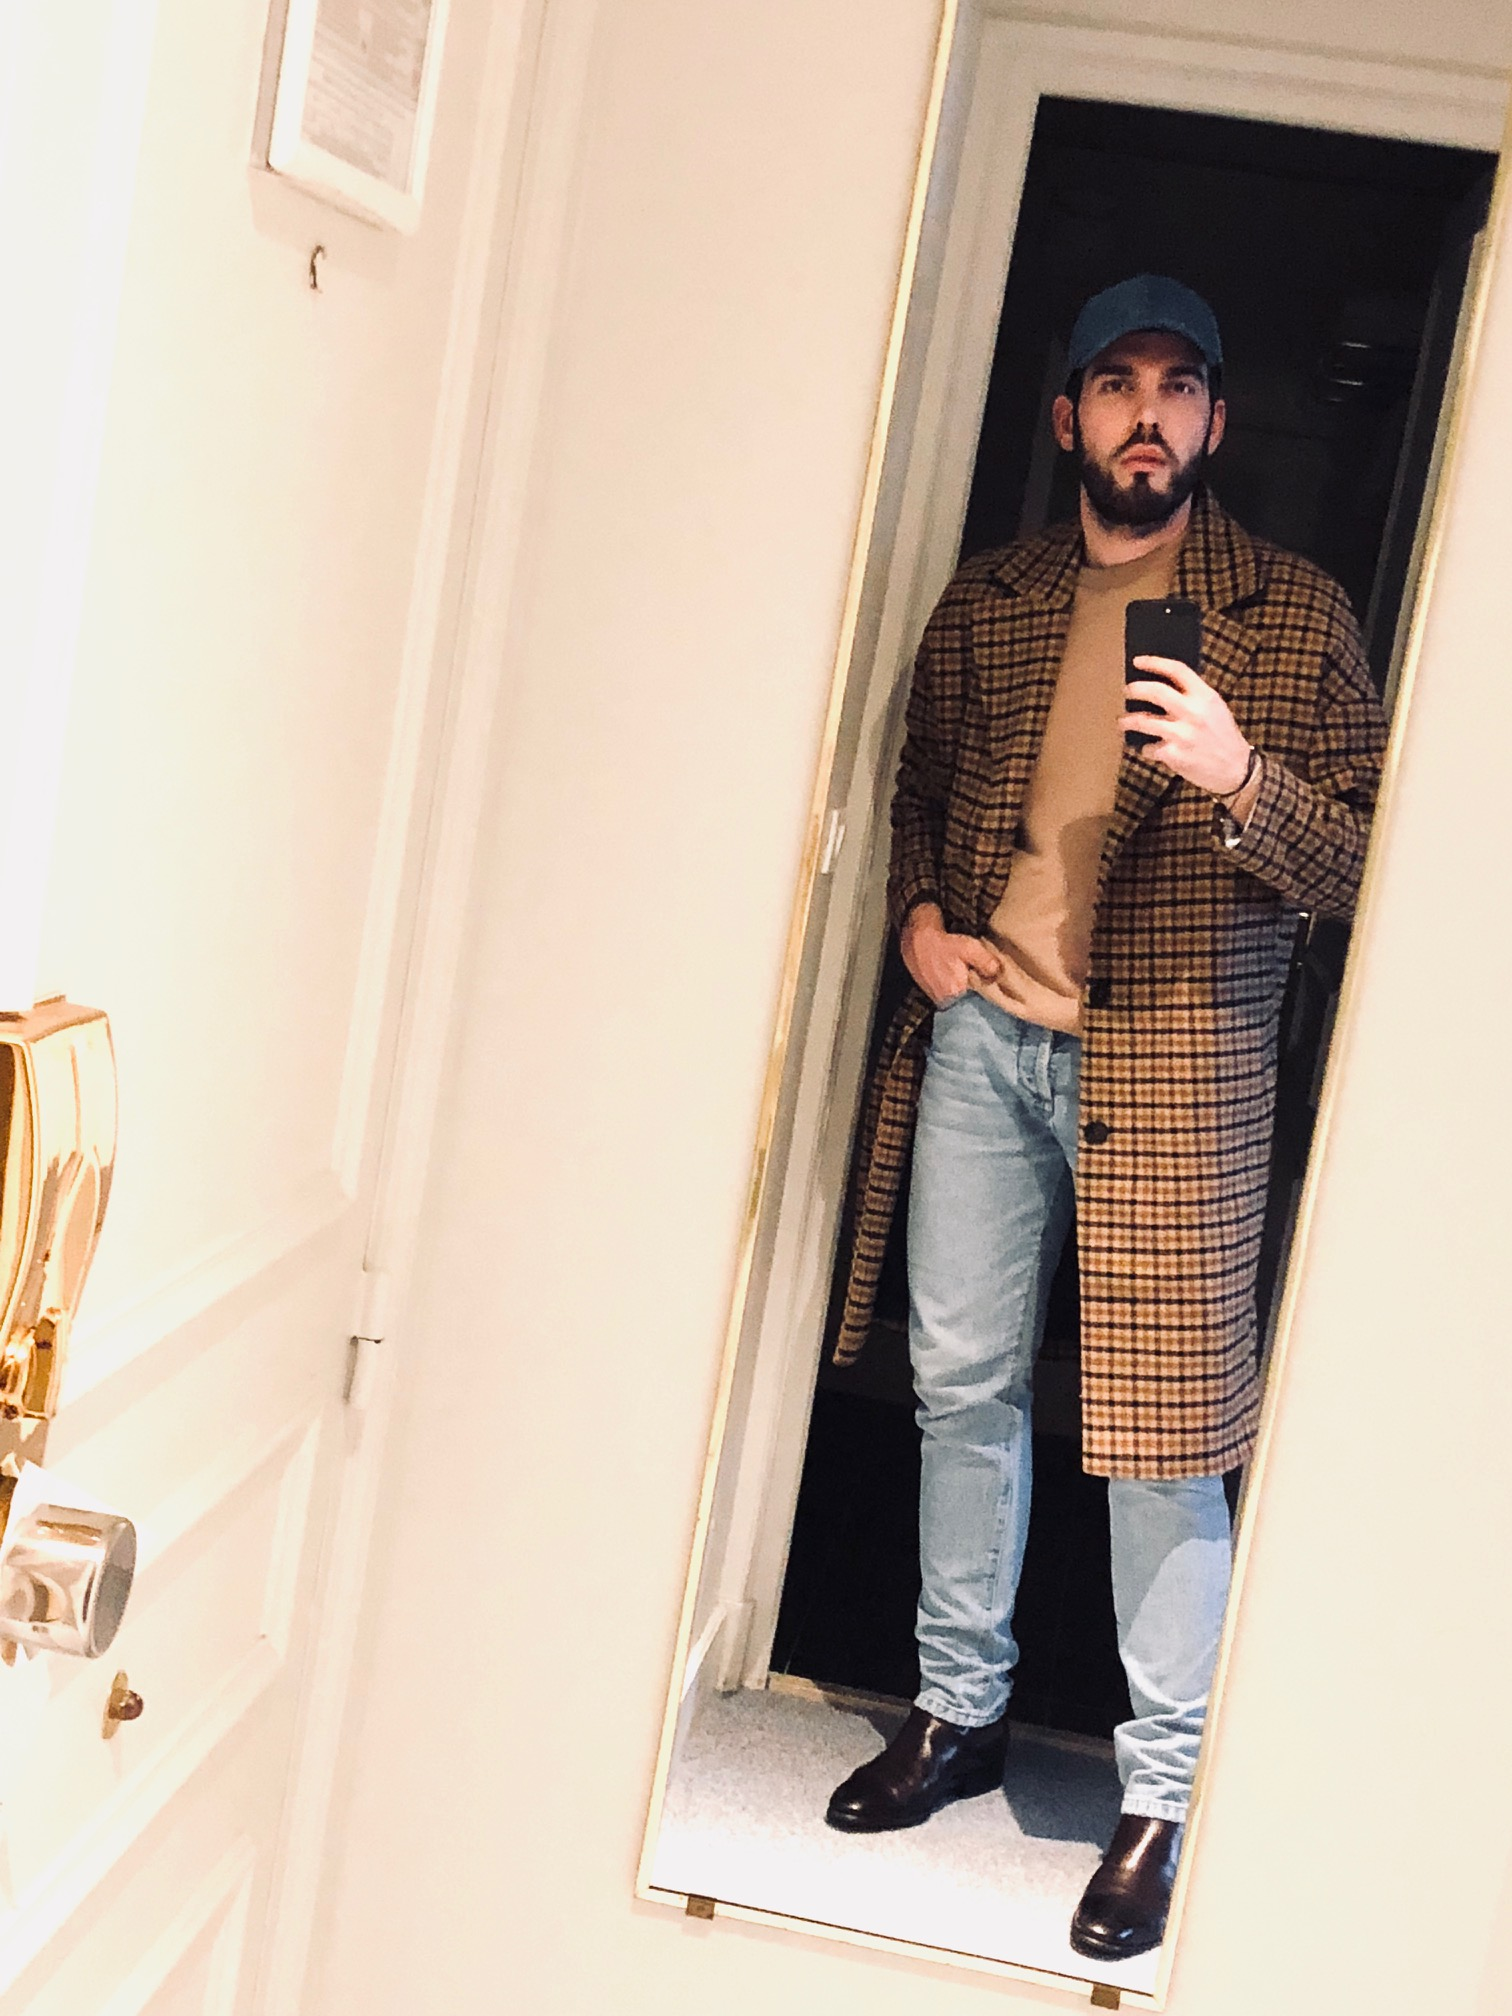 Cota: Zara / Pants: Levis / Knitwear: Acne / Shoes: Santoni Shoes